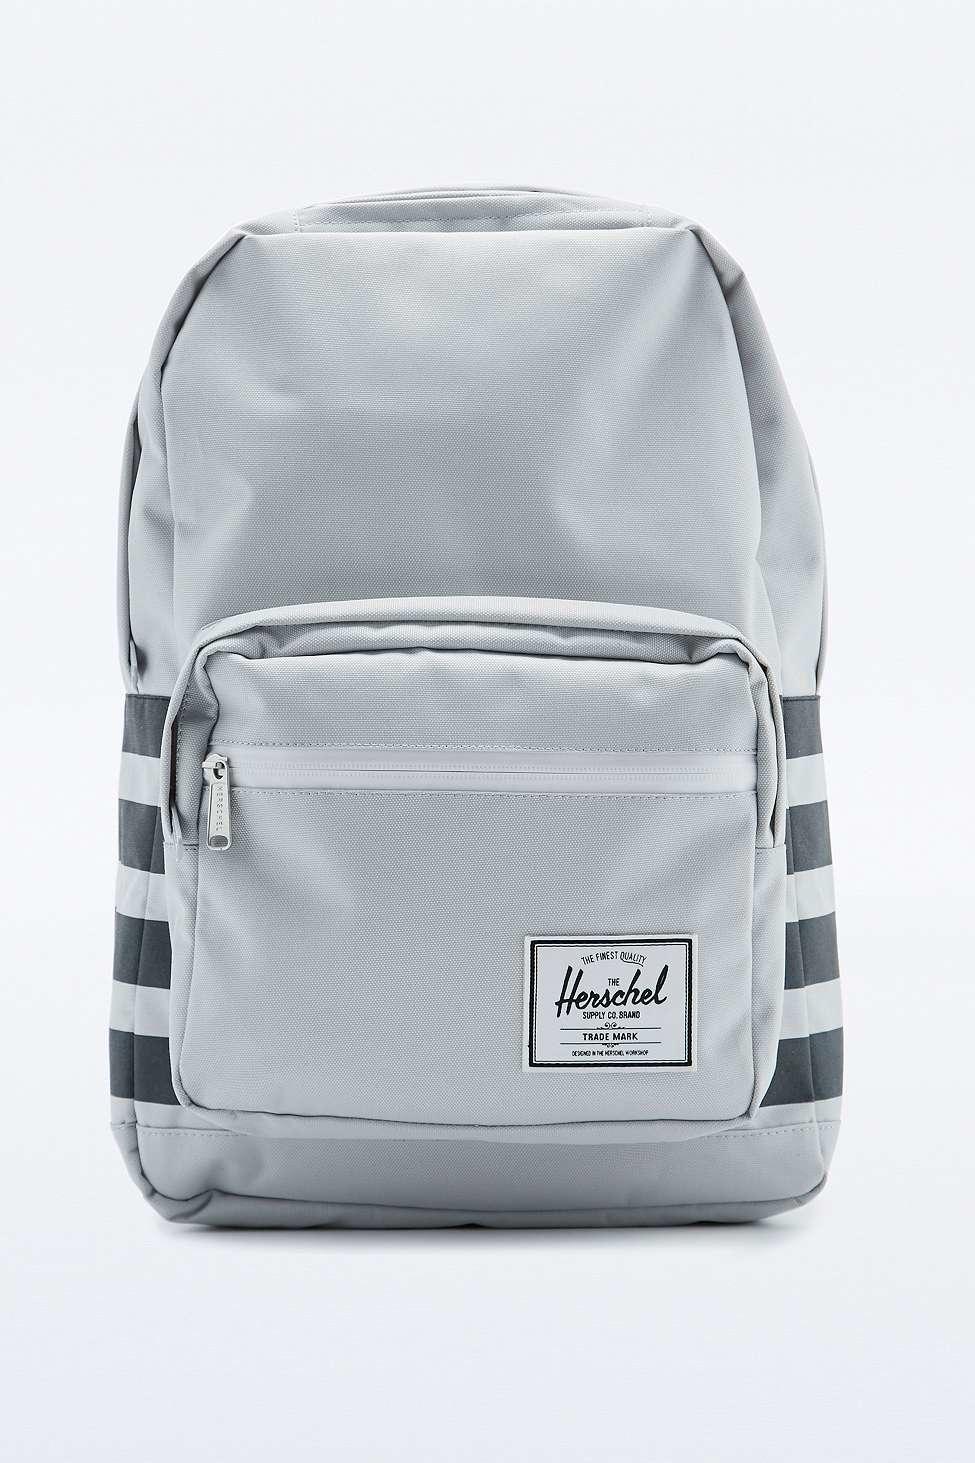 80a0f314a918 Herschel Supply Co. Pop Quiz Offset White Stripe Backpack in Gray ...